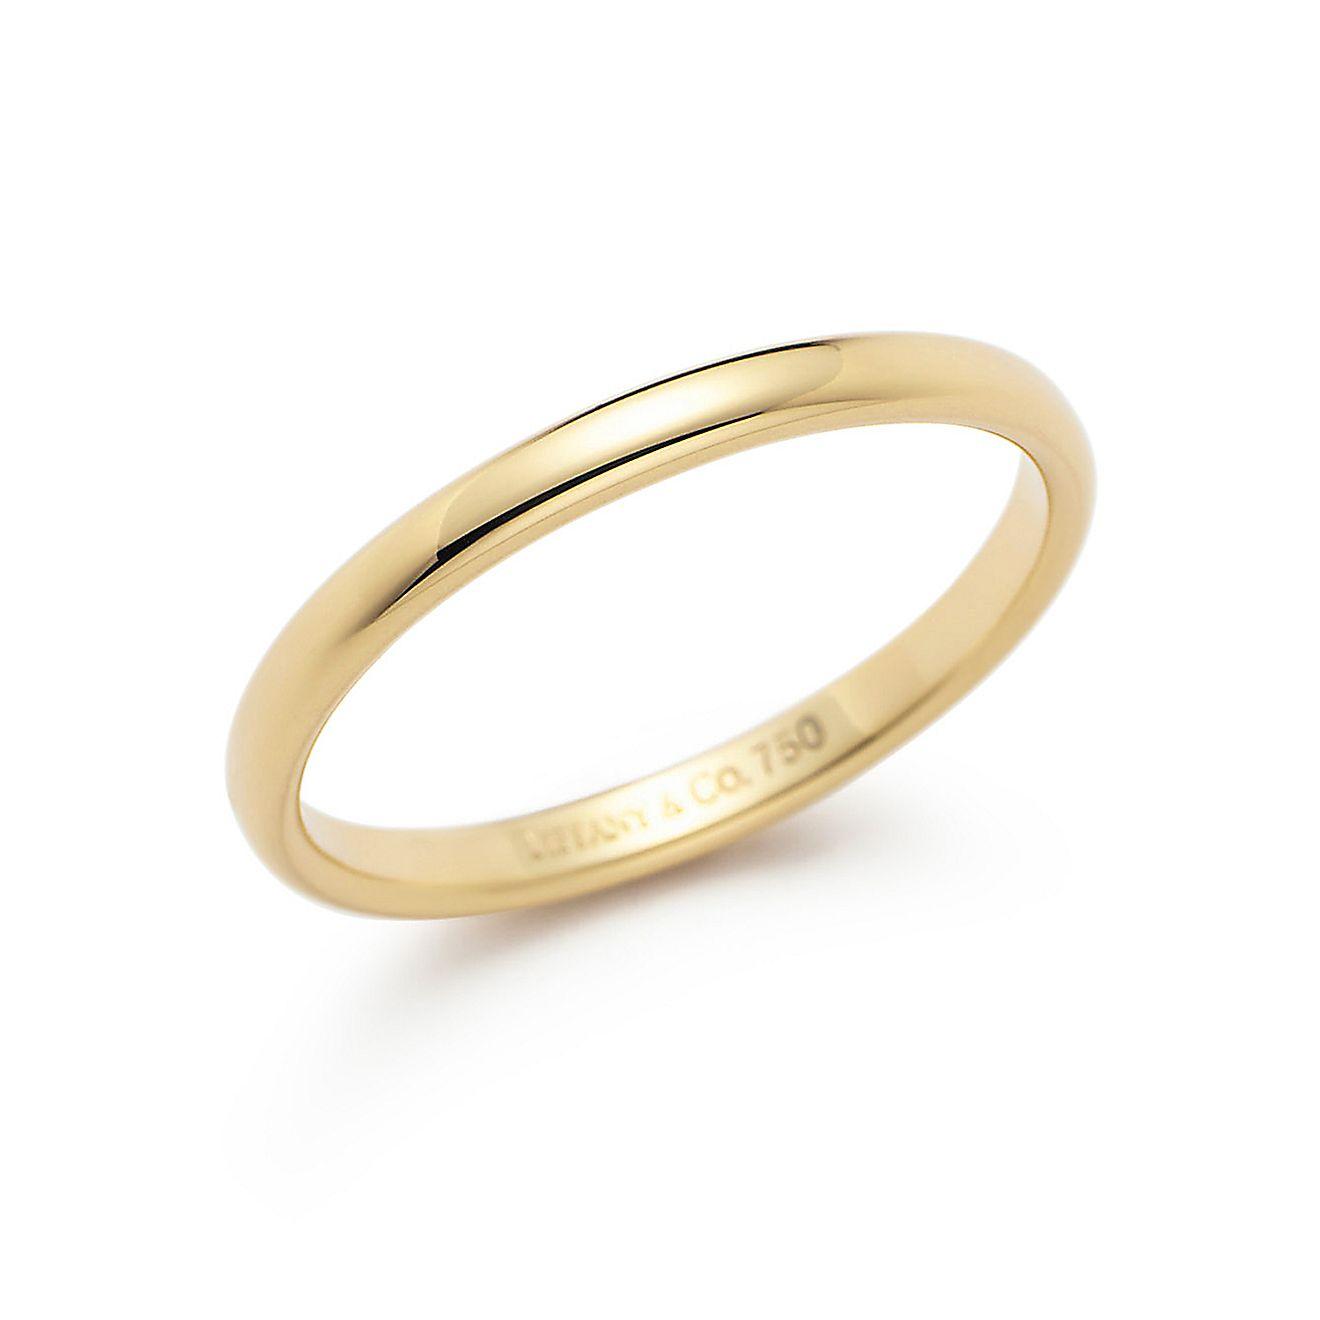 "Tiffany  Co. | Item | Print | Lucidaâ""¢ wedding band ring in 18k gold ..."